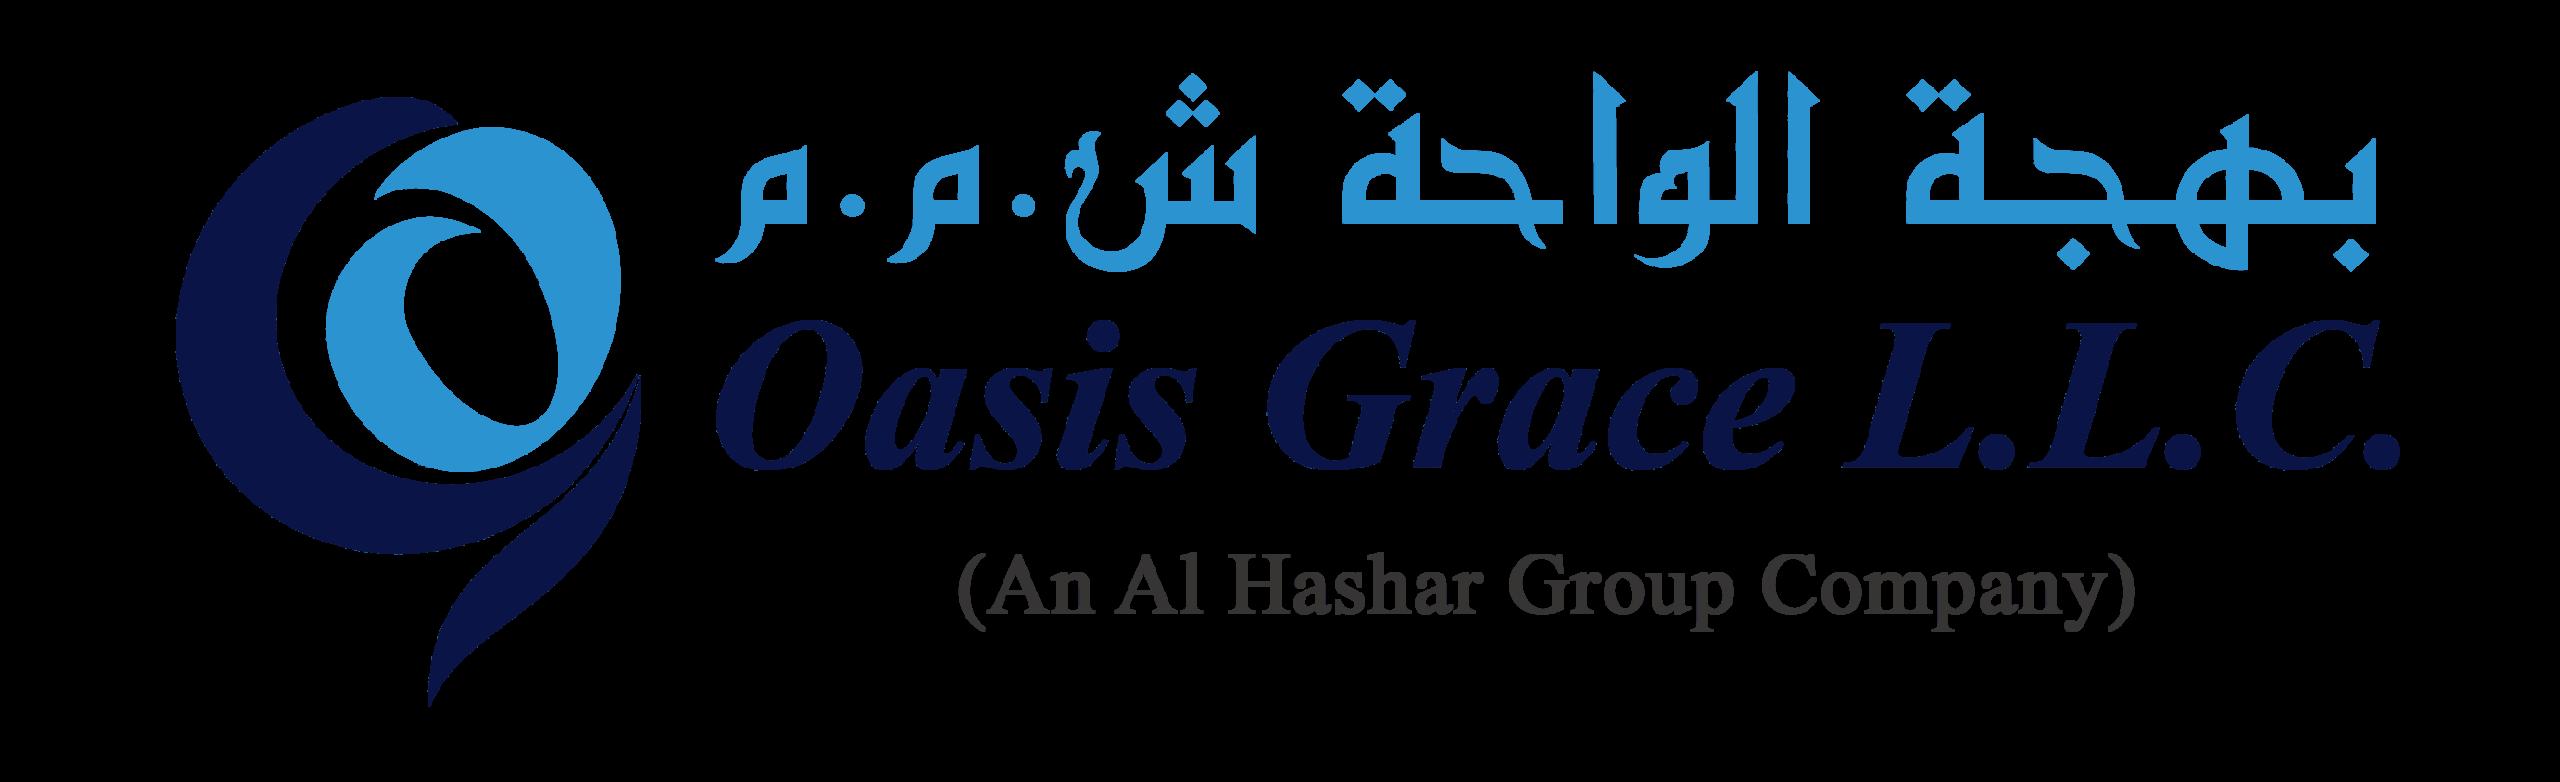 Oasisgrace LLC